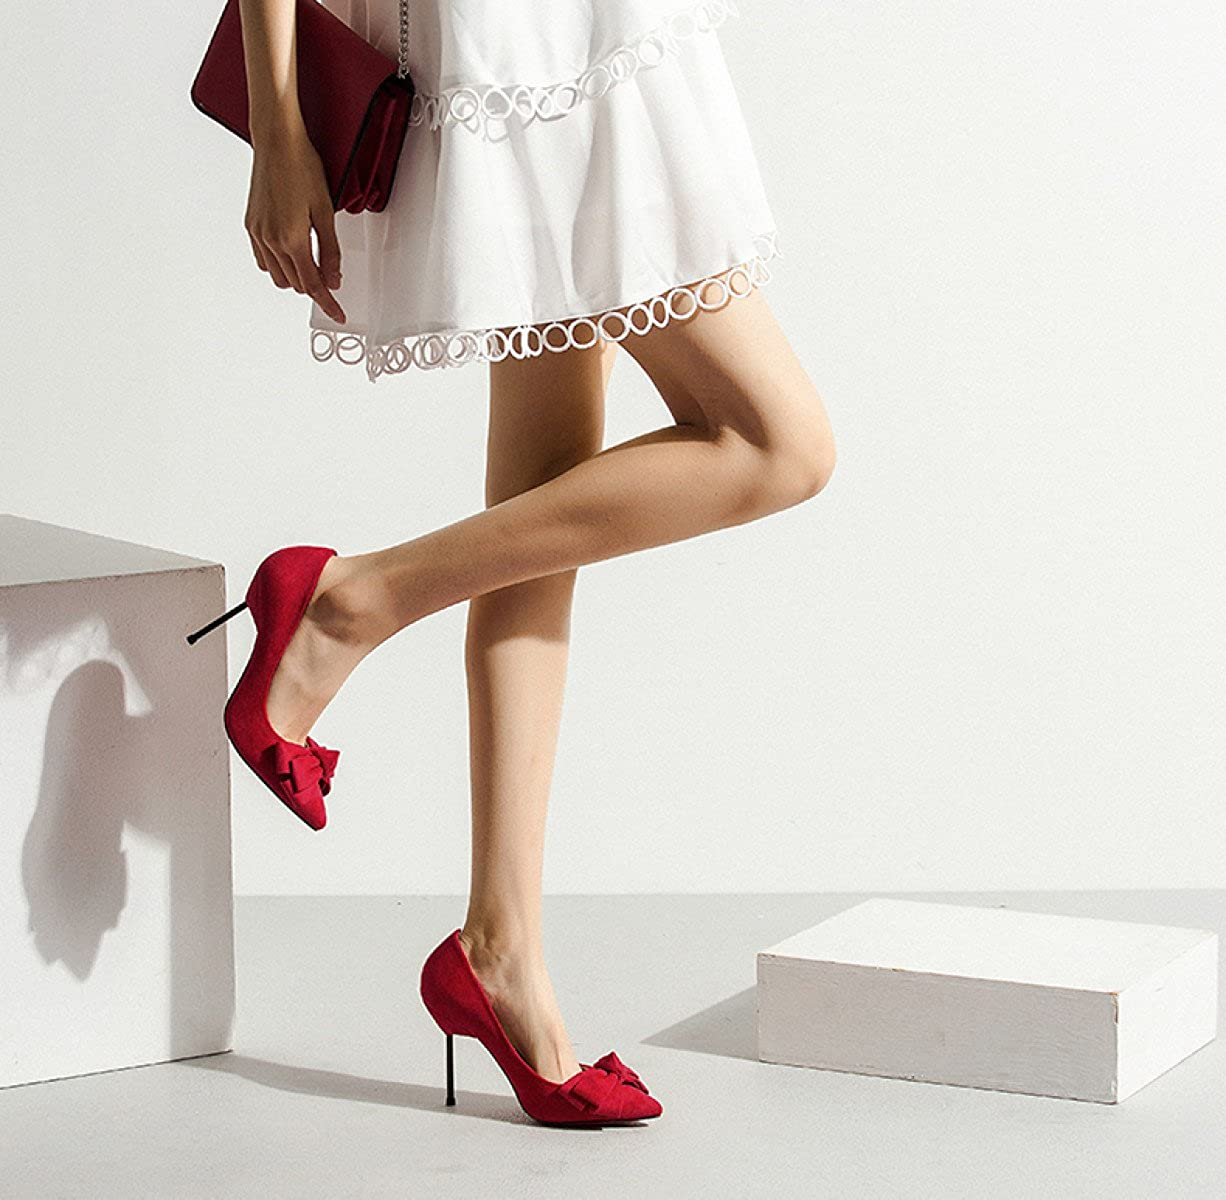 ZPFME Damen Elegante Elegante Elegante Stiletto High Heels Neue Damen Bow Smart Spitzschuh Party Pumps 659d83